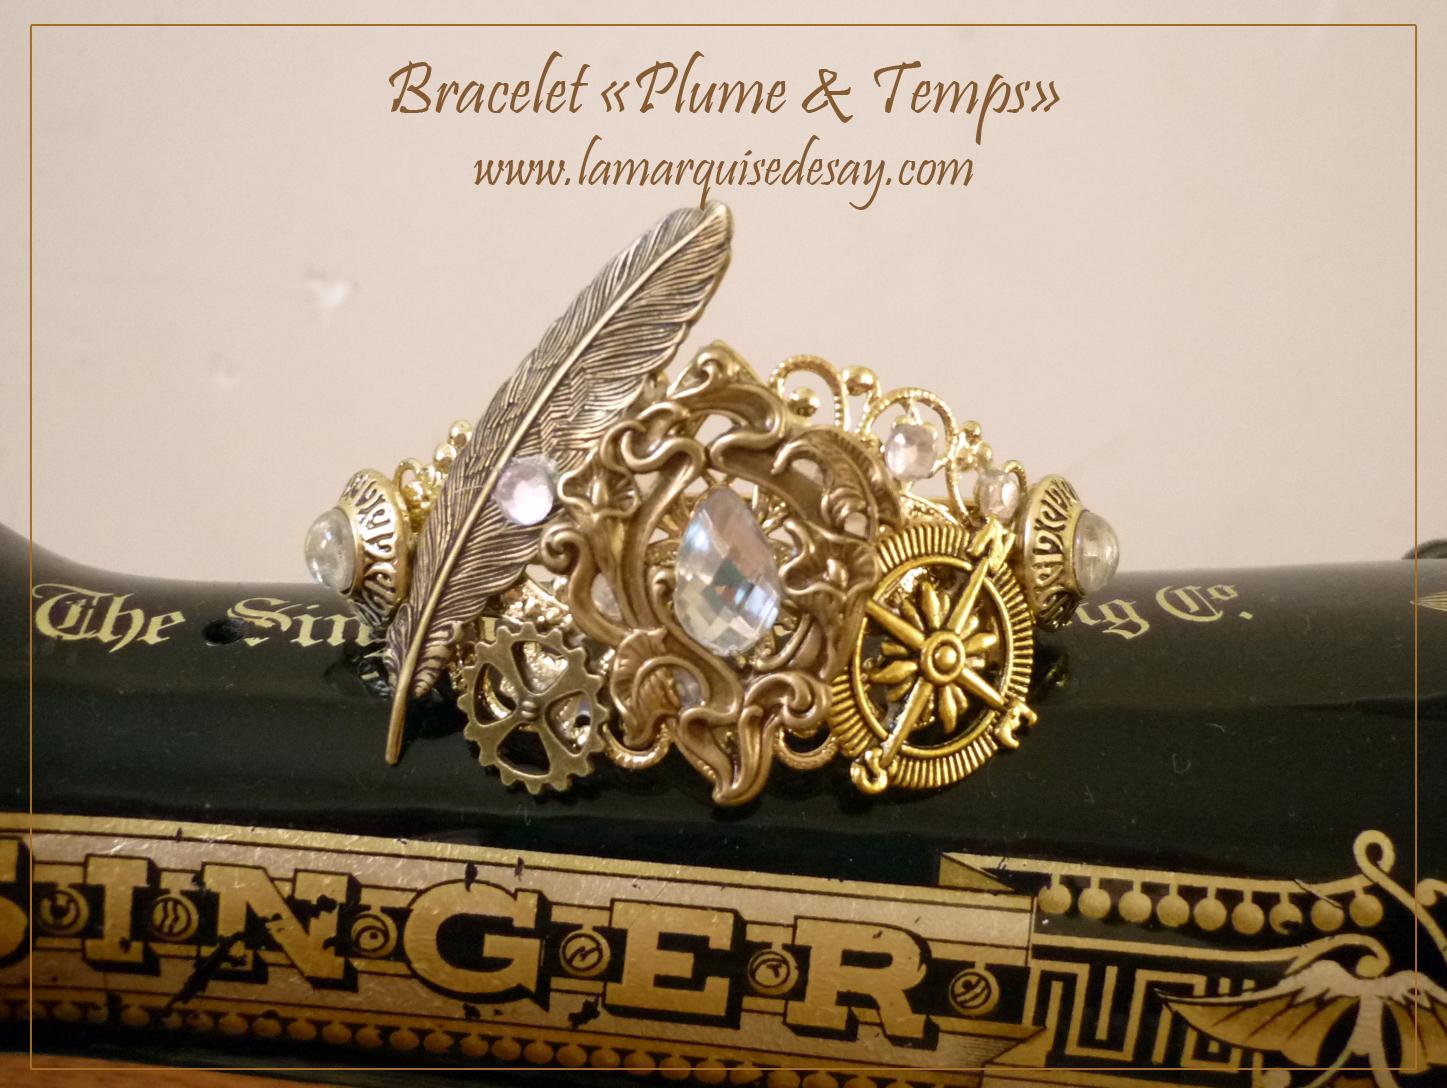 Bracelet Plume & temps, style steampunk (EN VENTE)